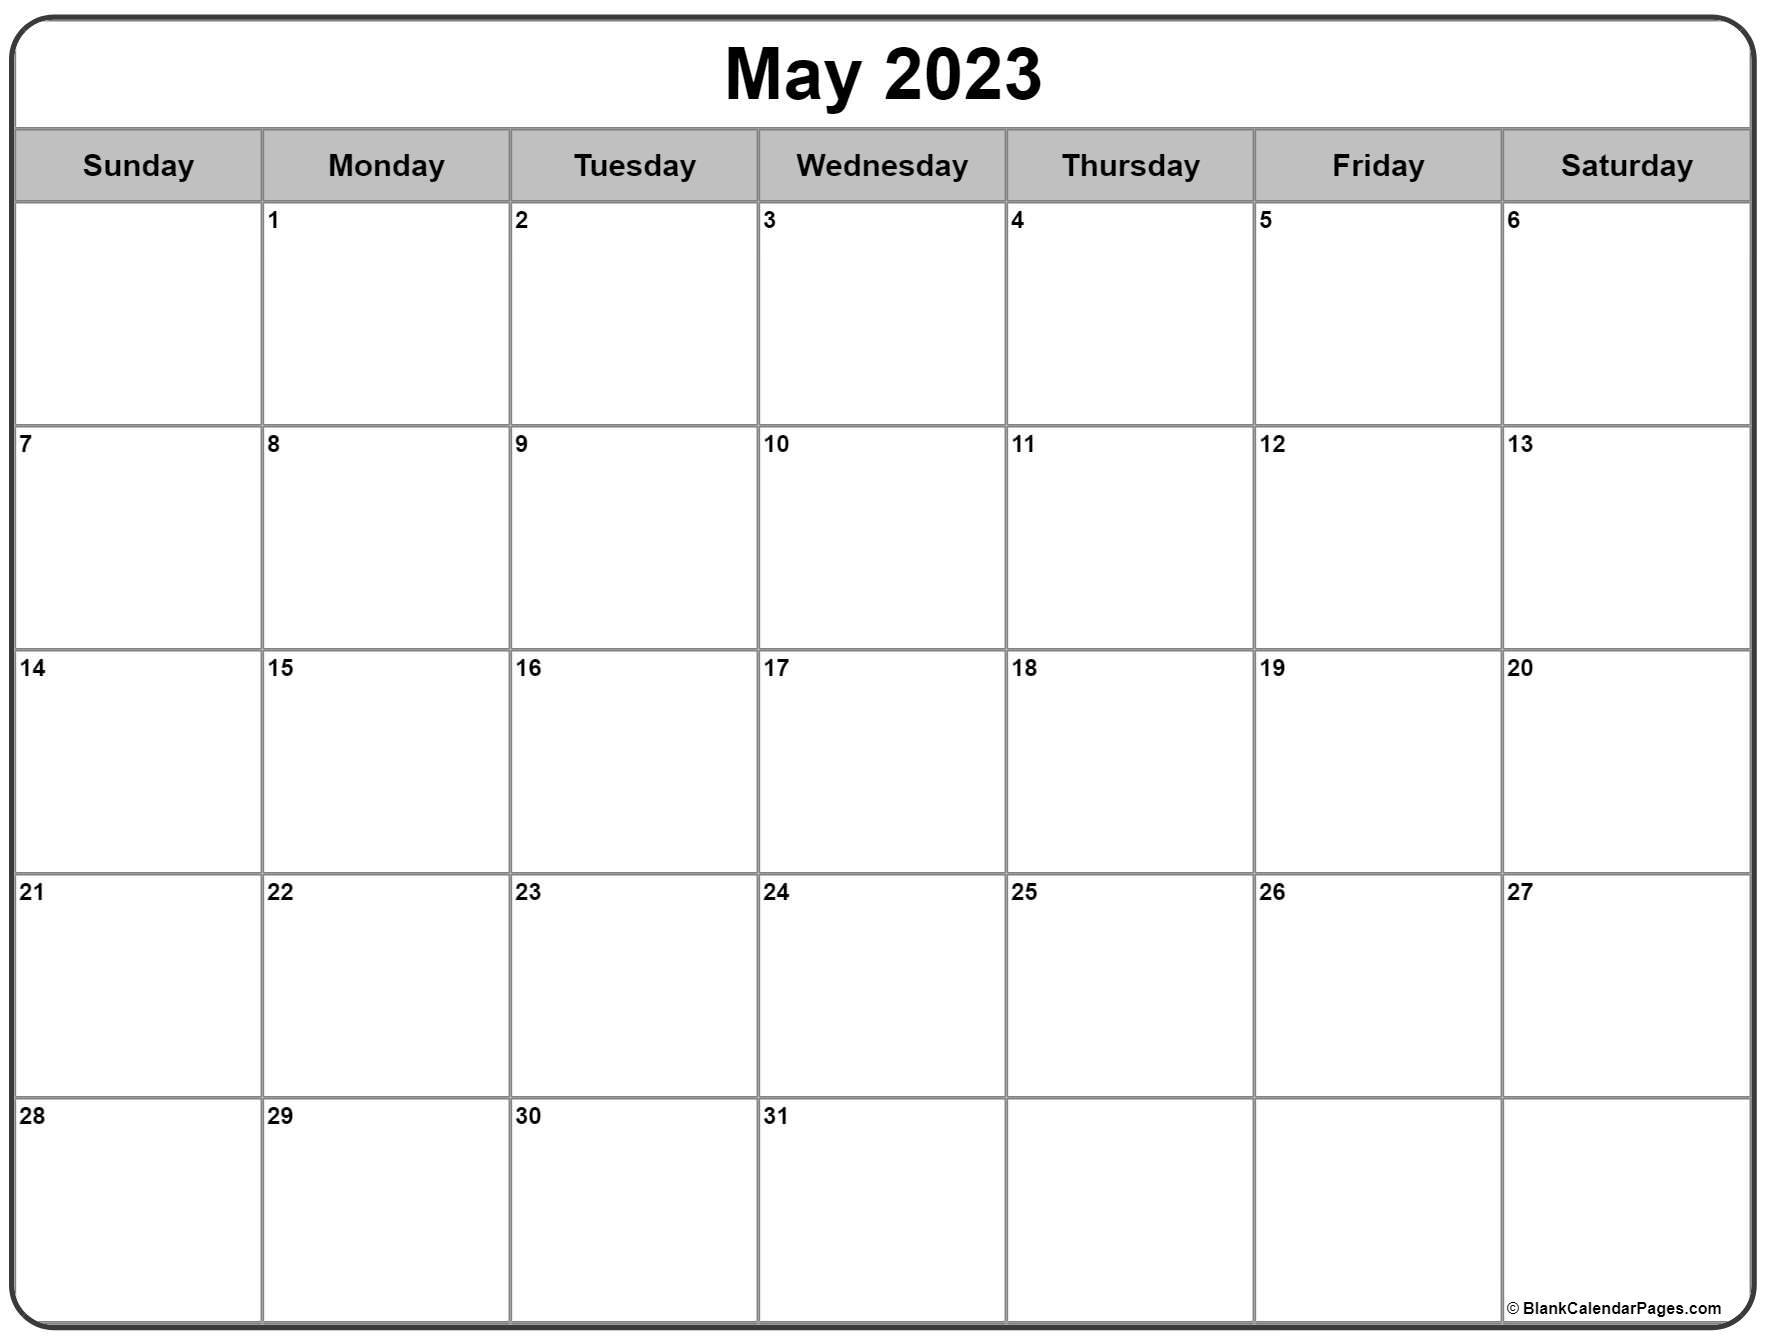 May 2022 calendar | free printable monthly calendars